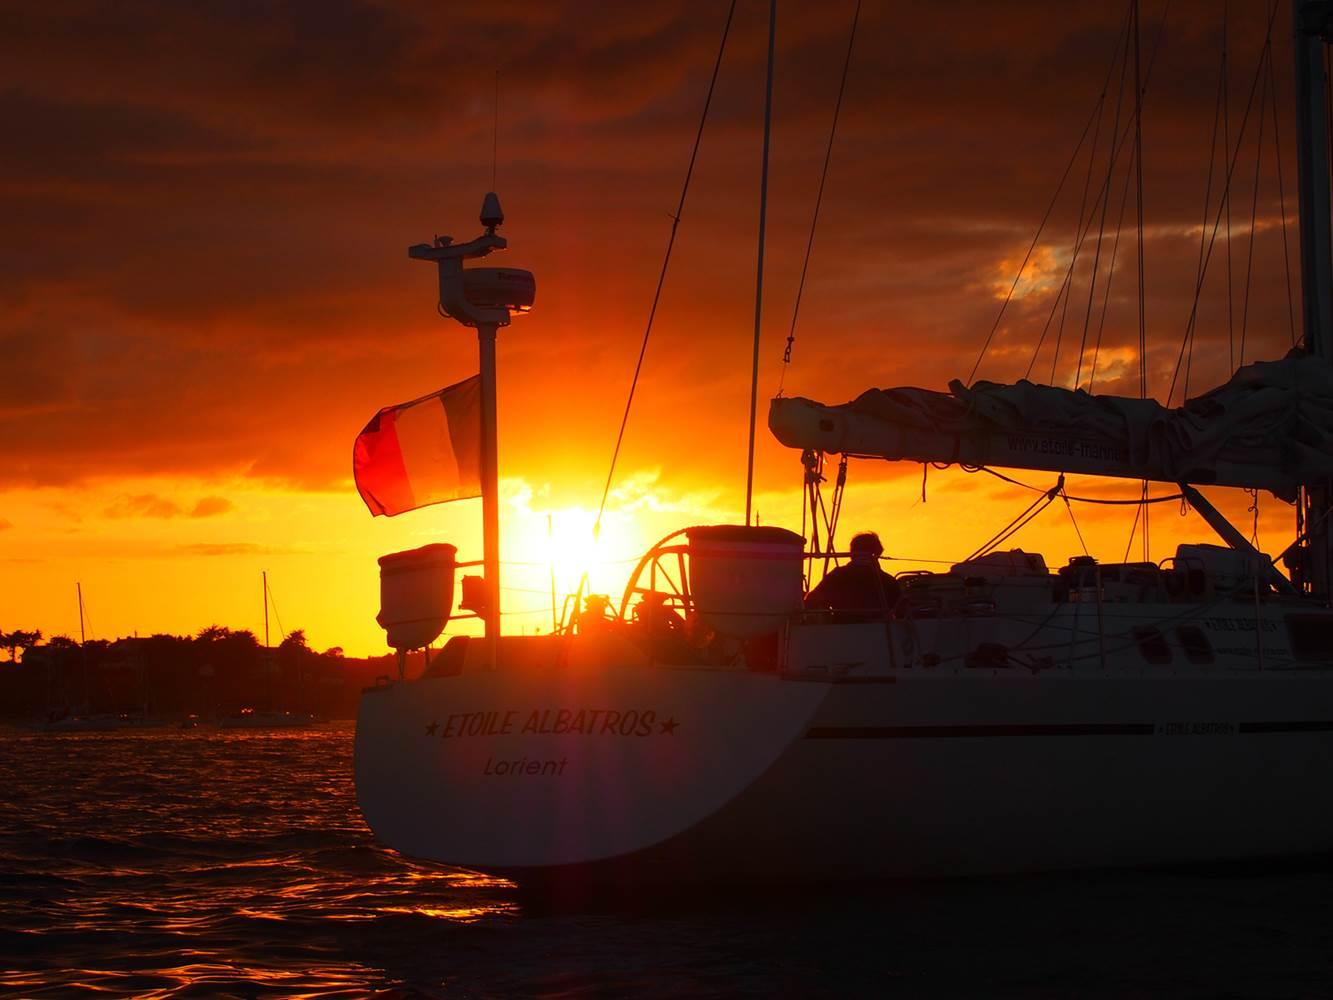 mouillage sunset Challenge67 ©